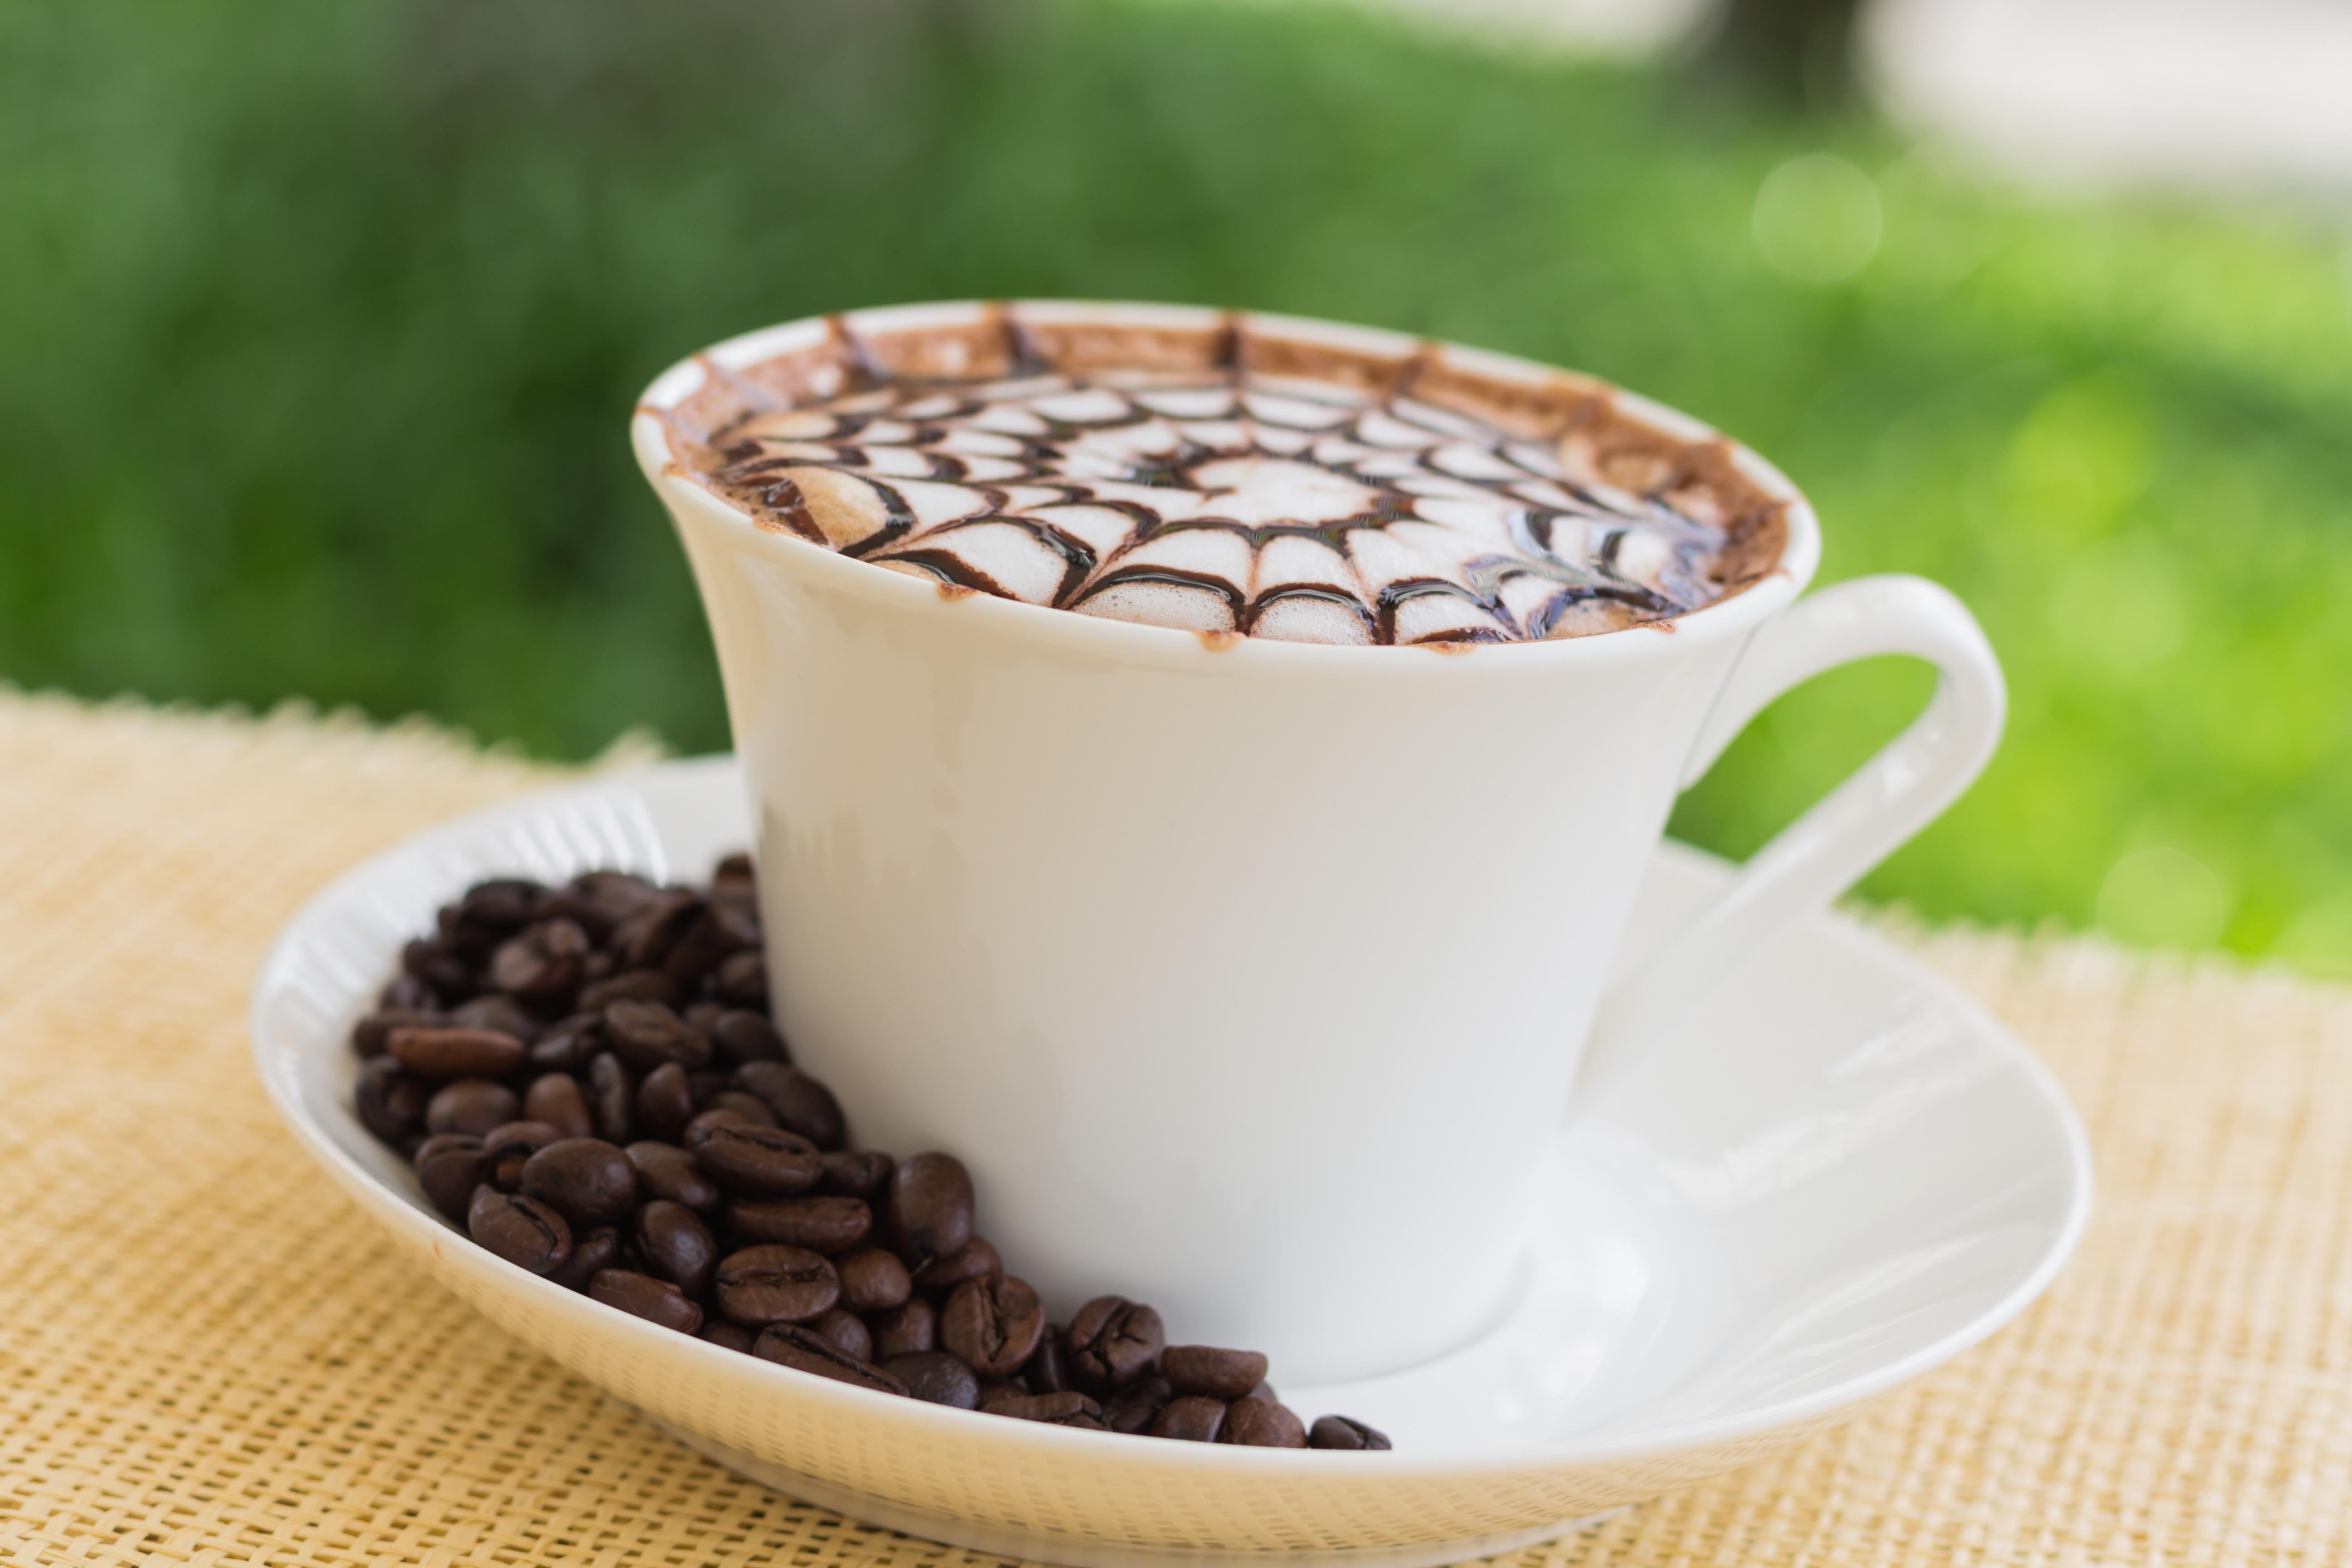 Gambar manis biji kopi latte coklat panas cappuccino pola gambar manis biji kopi latte coklat panas cappuccino pola hidangan makan makanan bersantai lepek minuman minum sarapan susu espreso altavistaventures Image collections